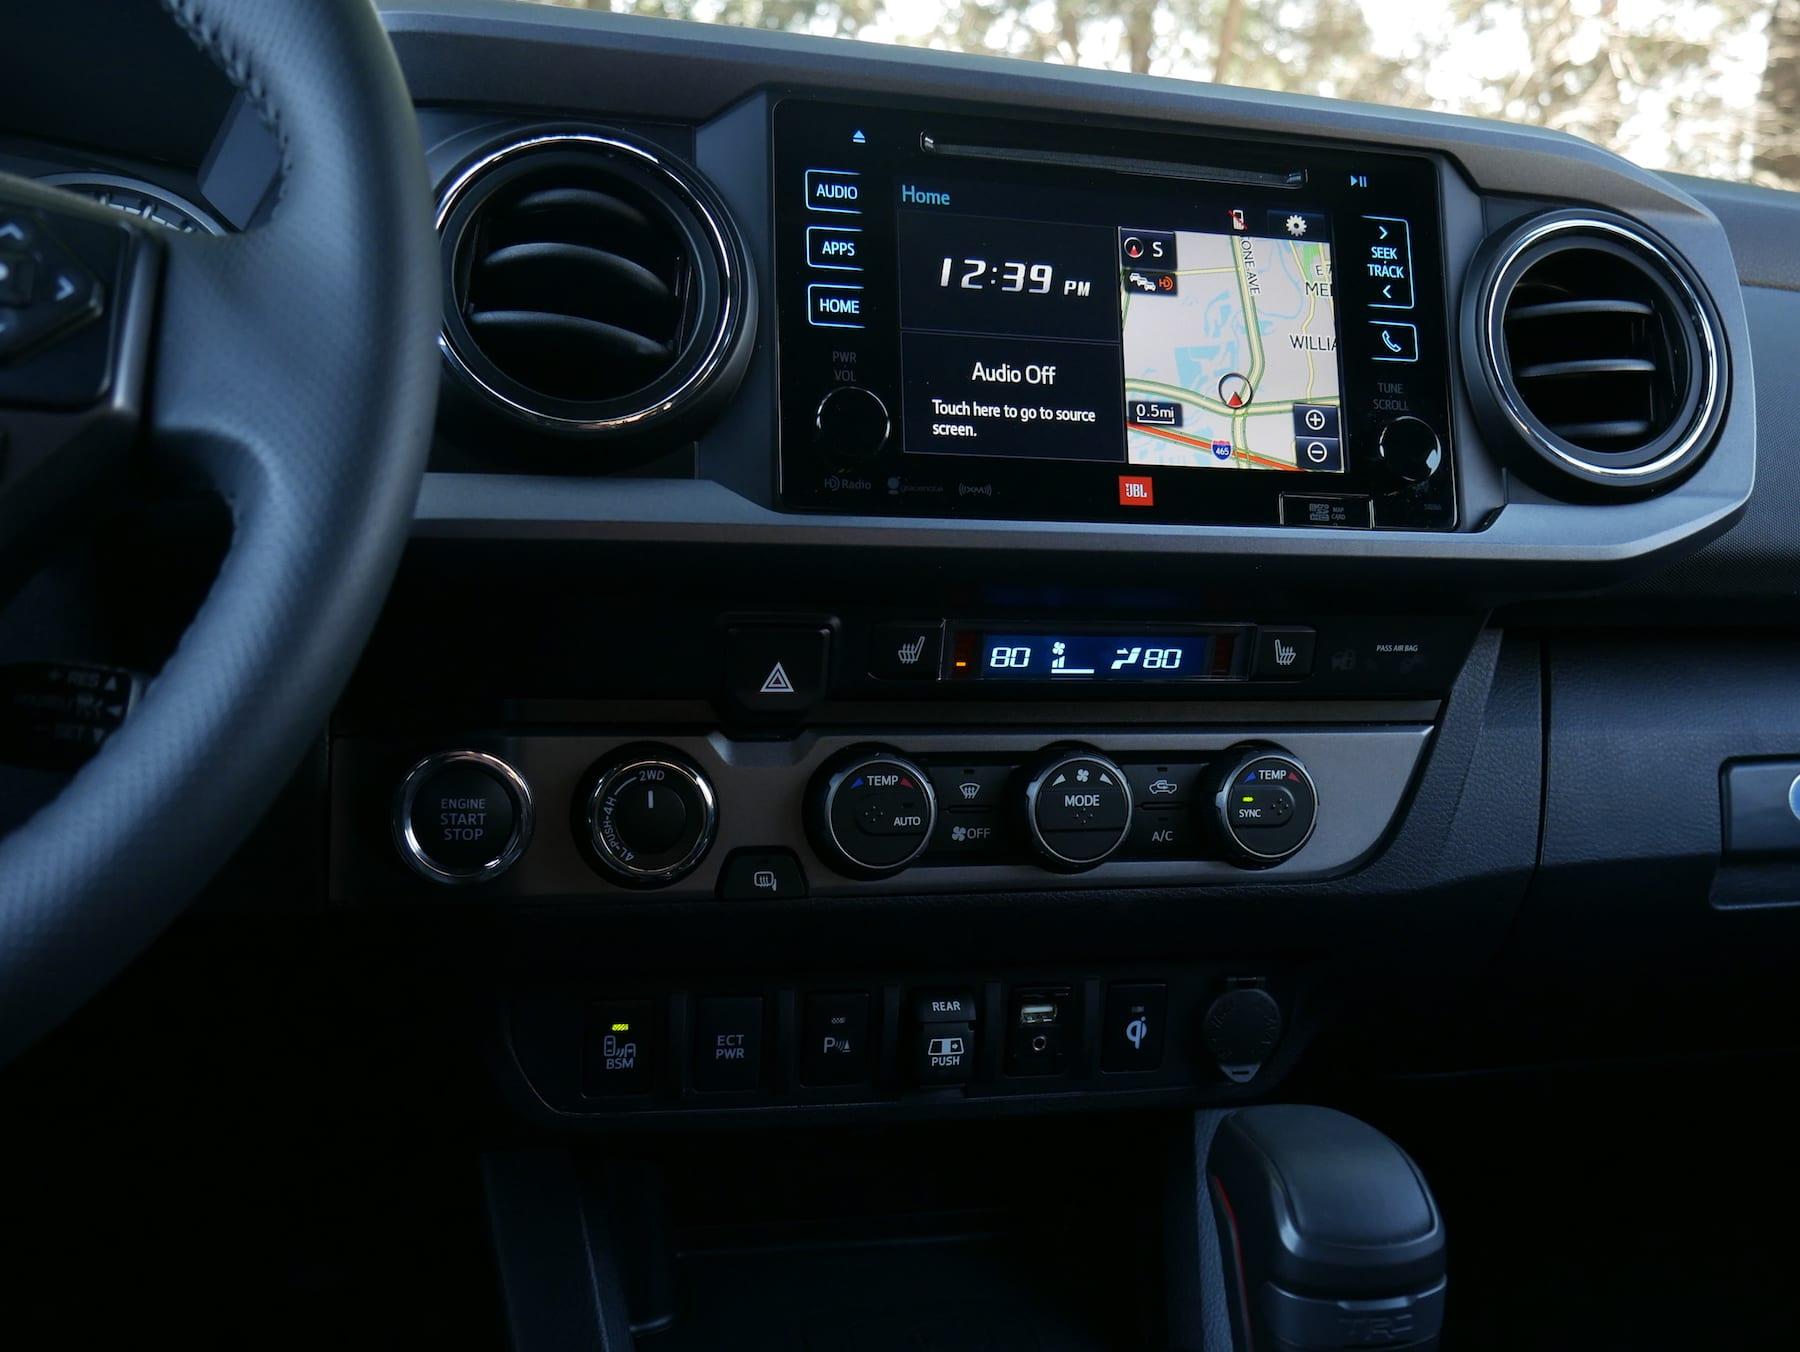 2019 Toyota Tacoma TRD Pro infotainment